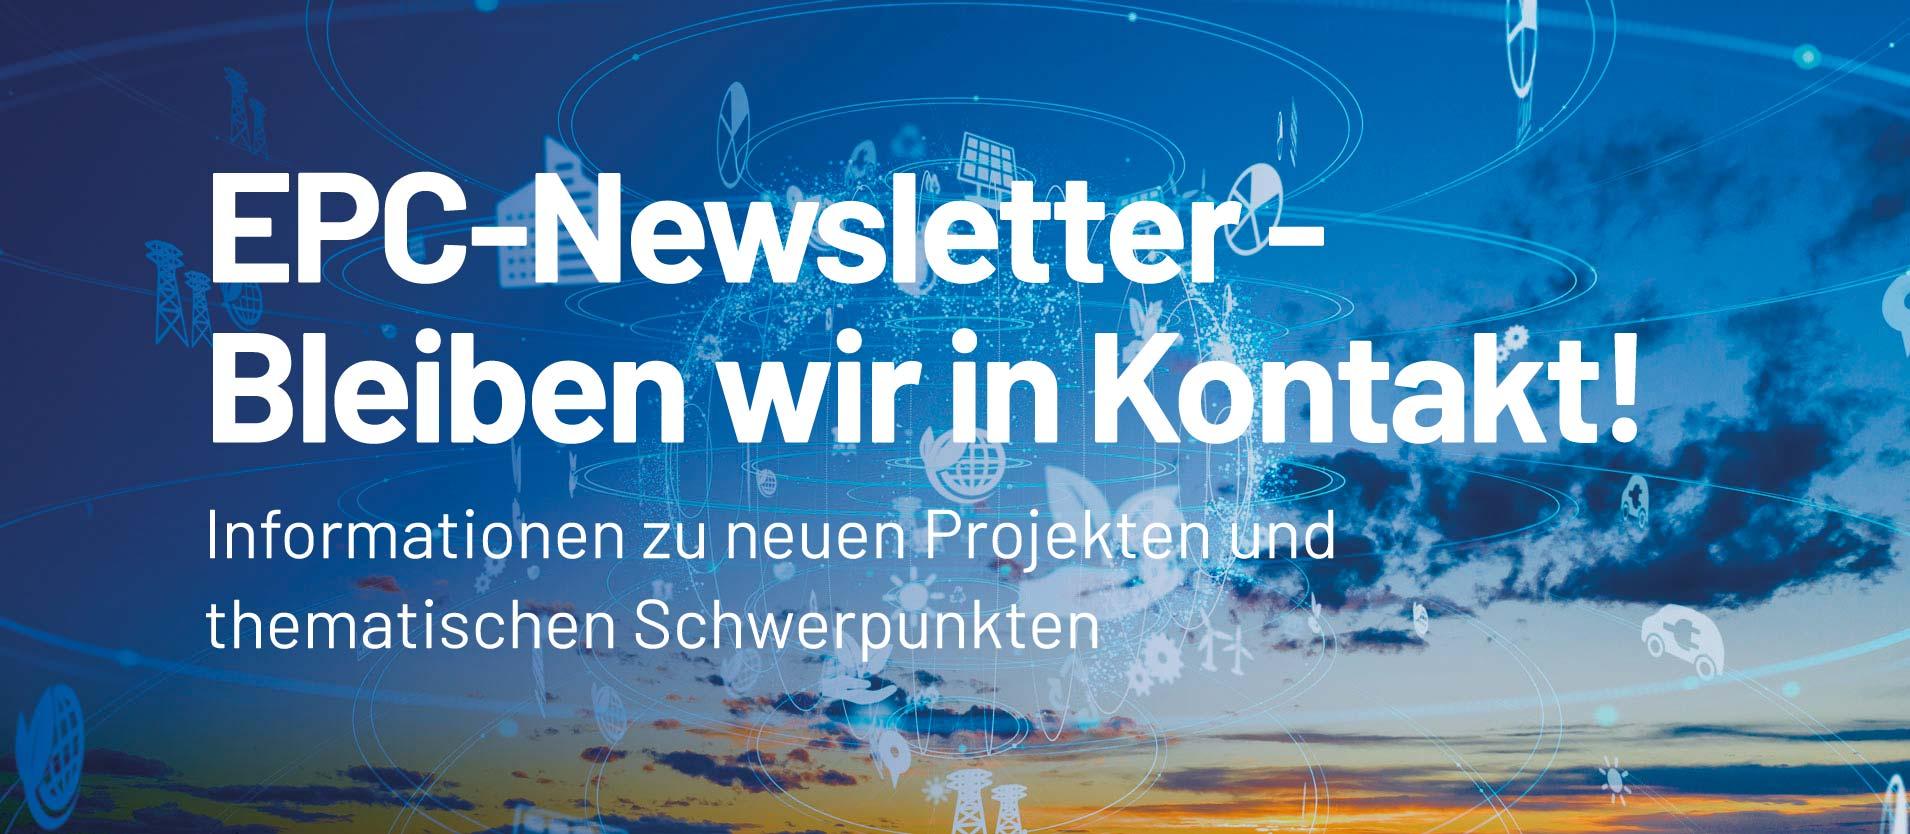 epc newsletter